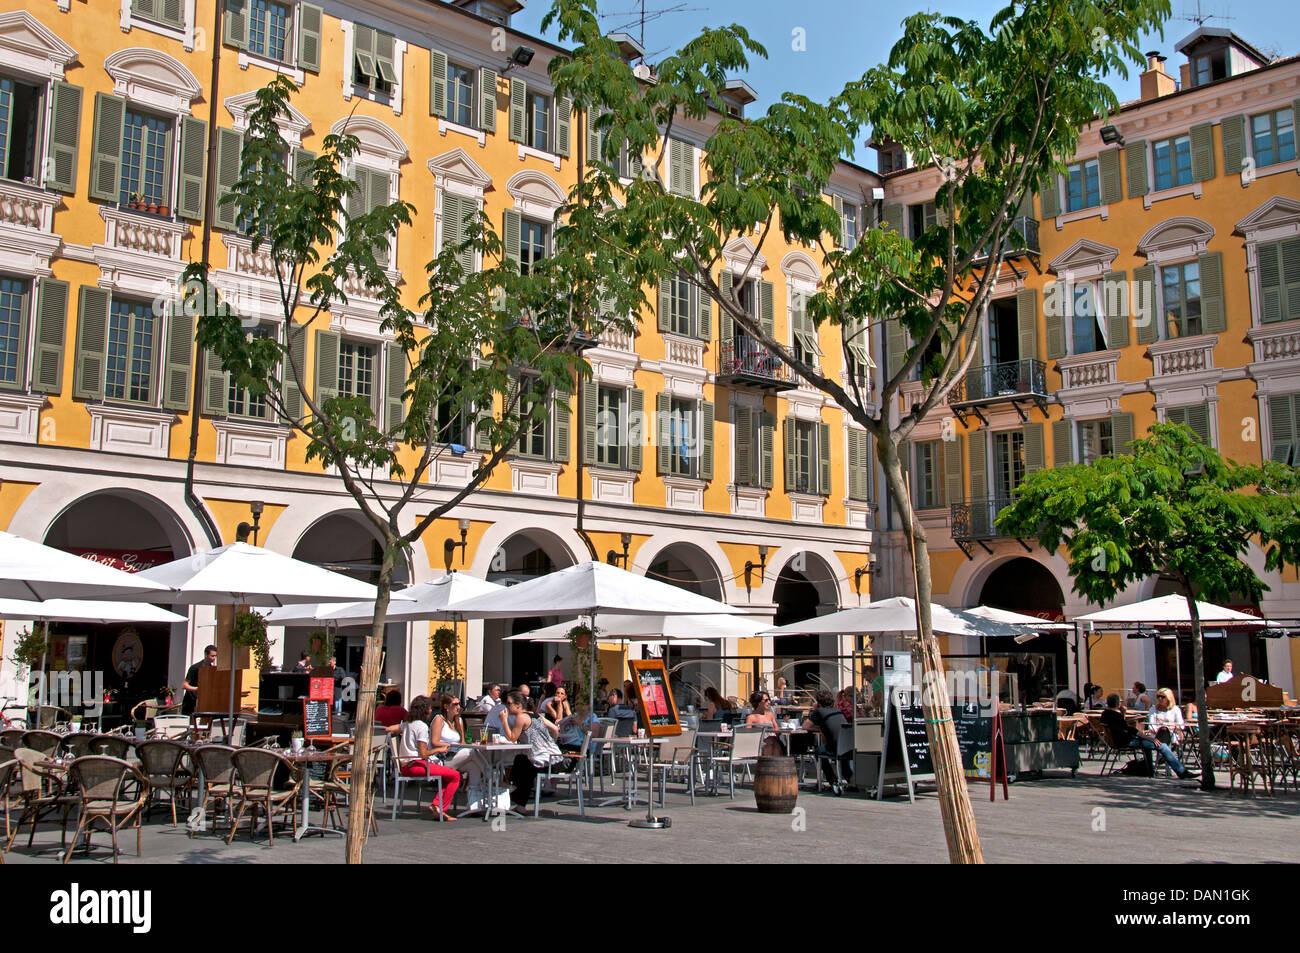 Restaurant Place Garibaldi Nice French Riviera Cote D'Azur France Stock Photo